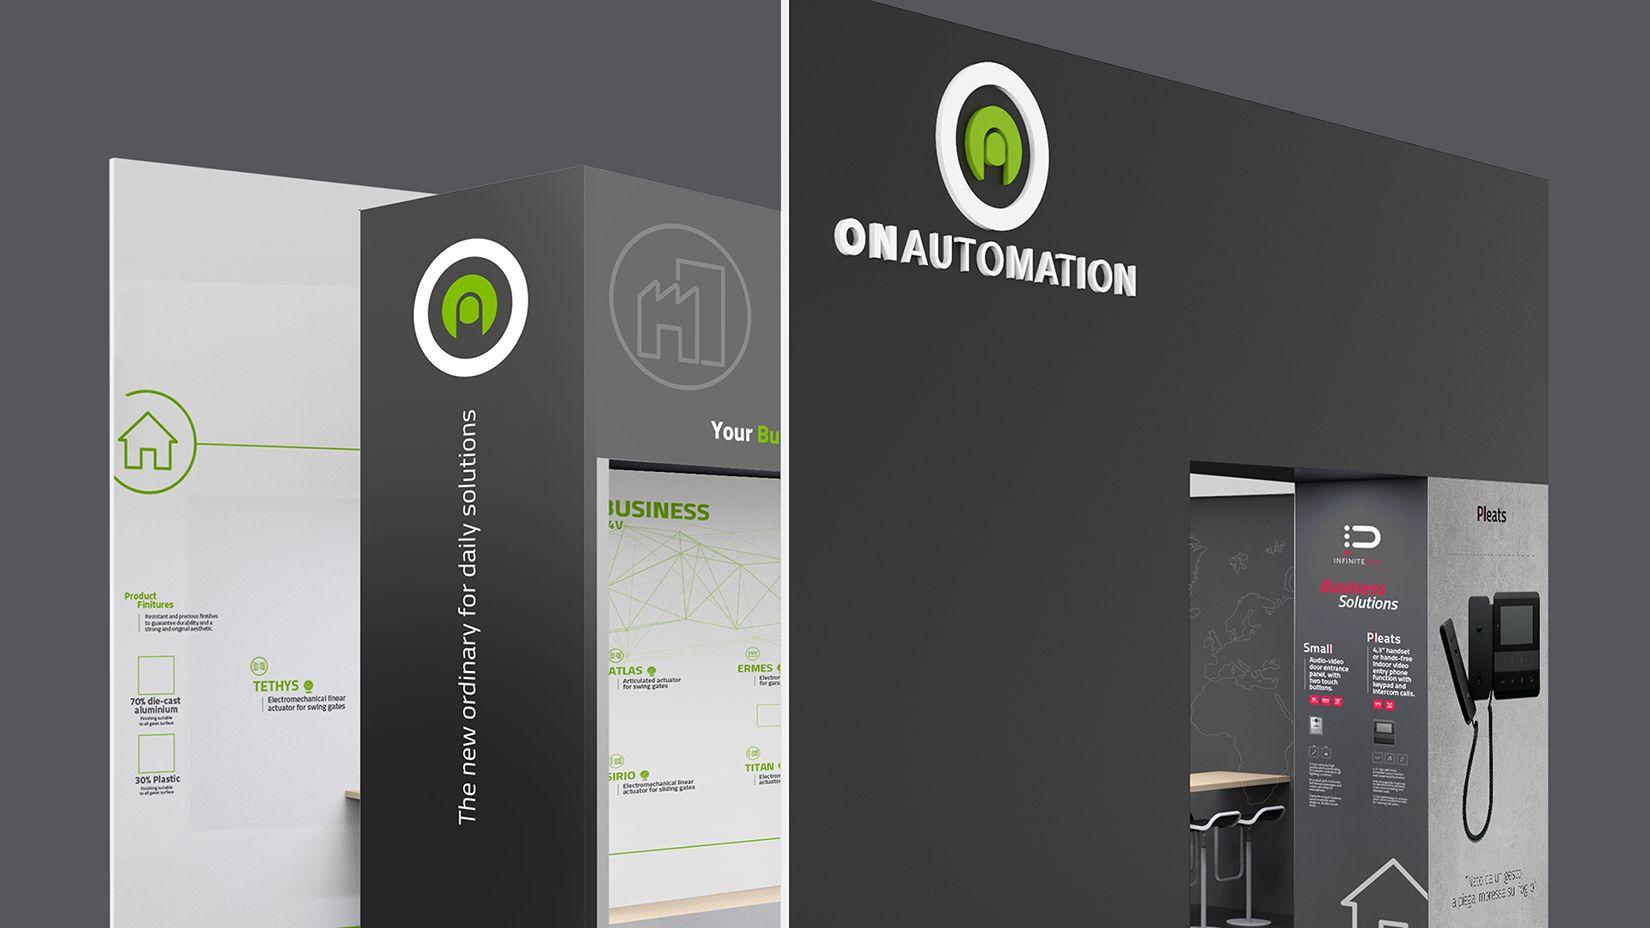 Allestimenti Fieristici Design Stand R+T 2018 OnAutomation 04